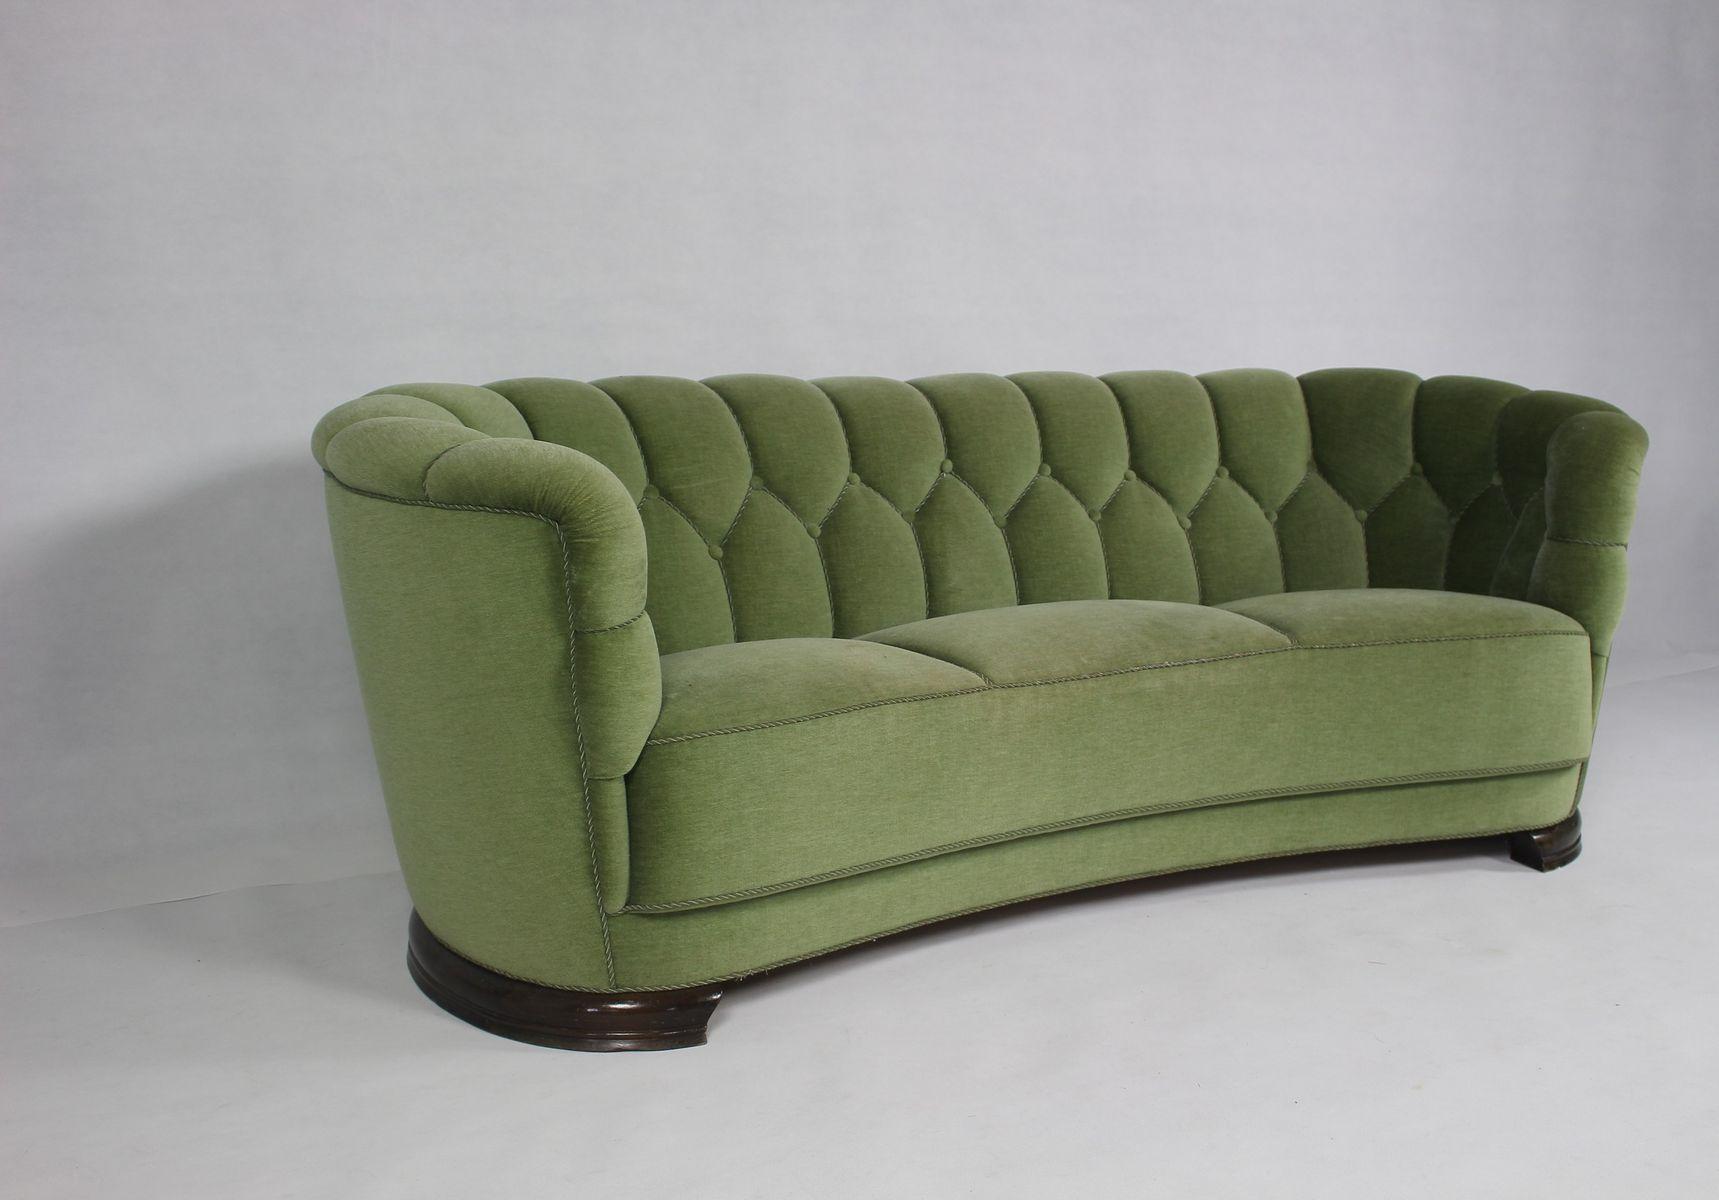 Mid century modern danish green curved sofa for sale at pamono for Mid century modern sofa for sale